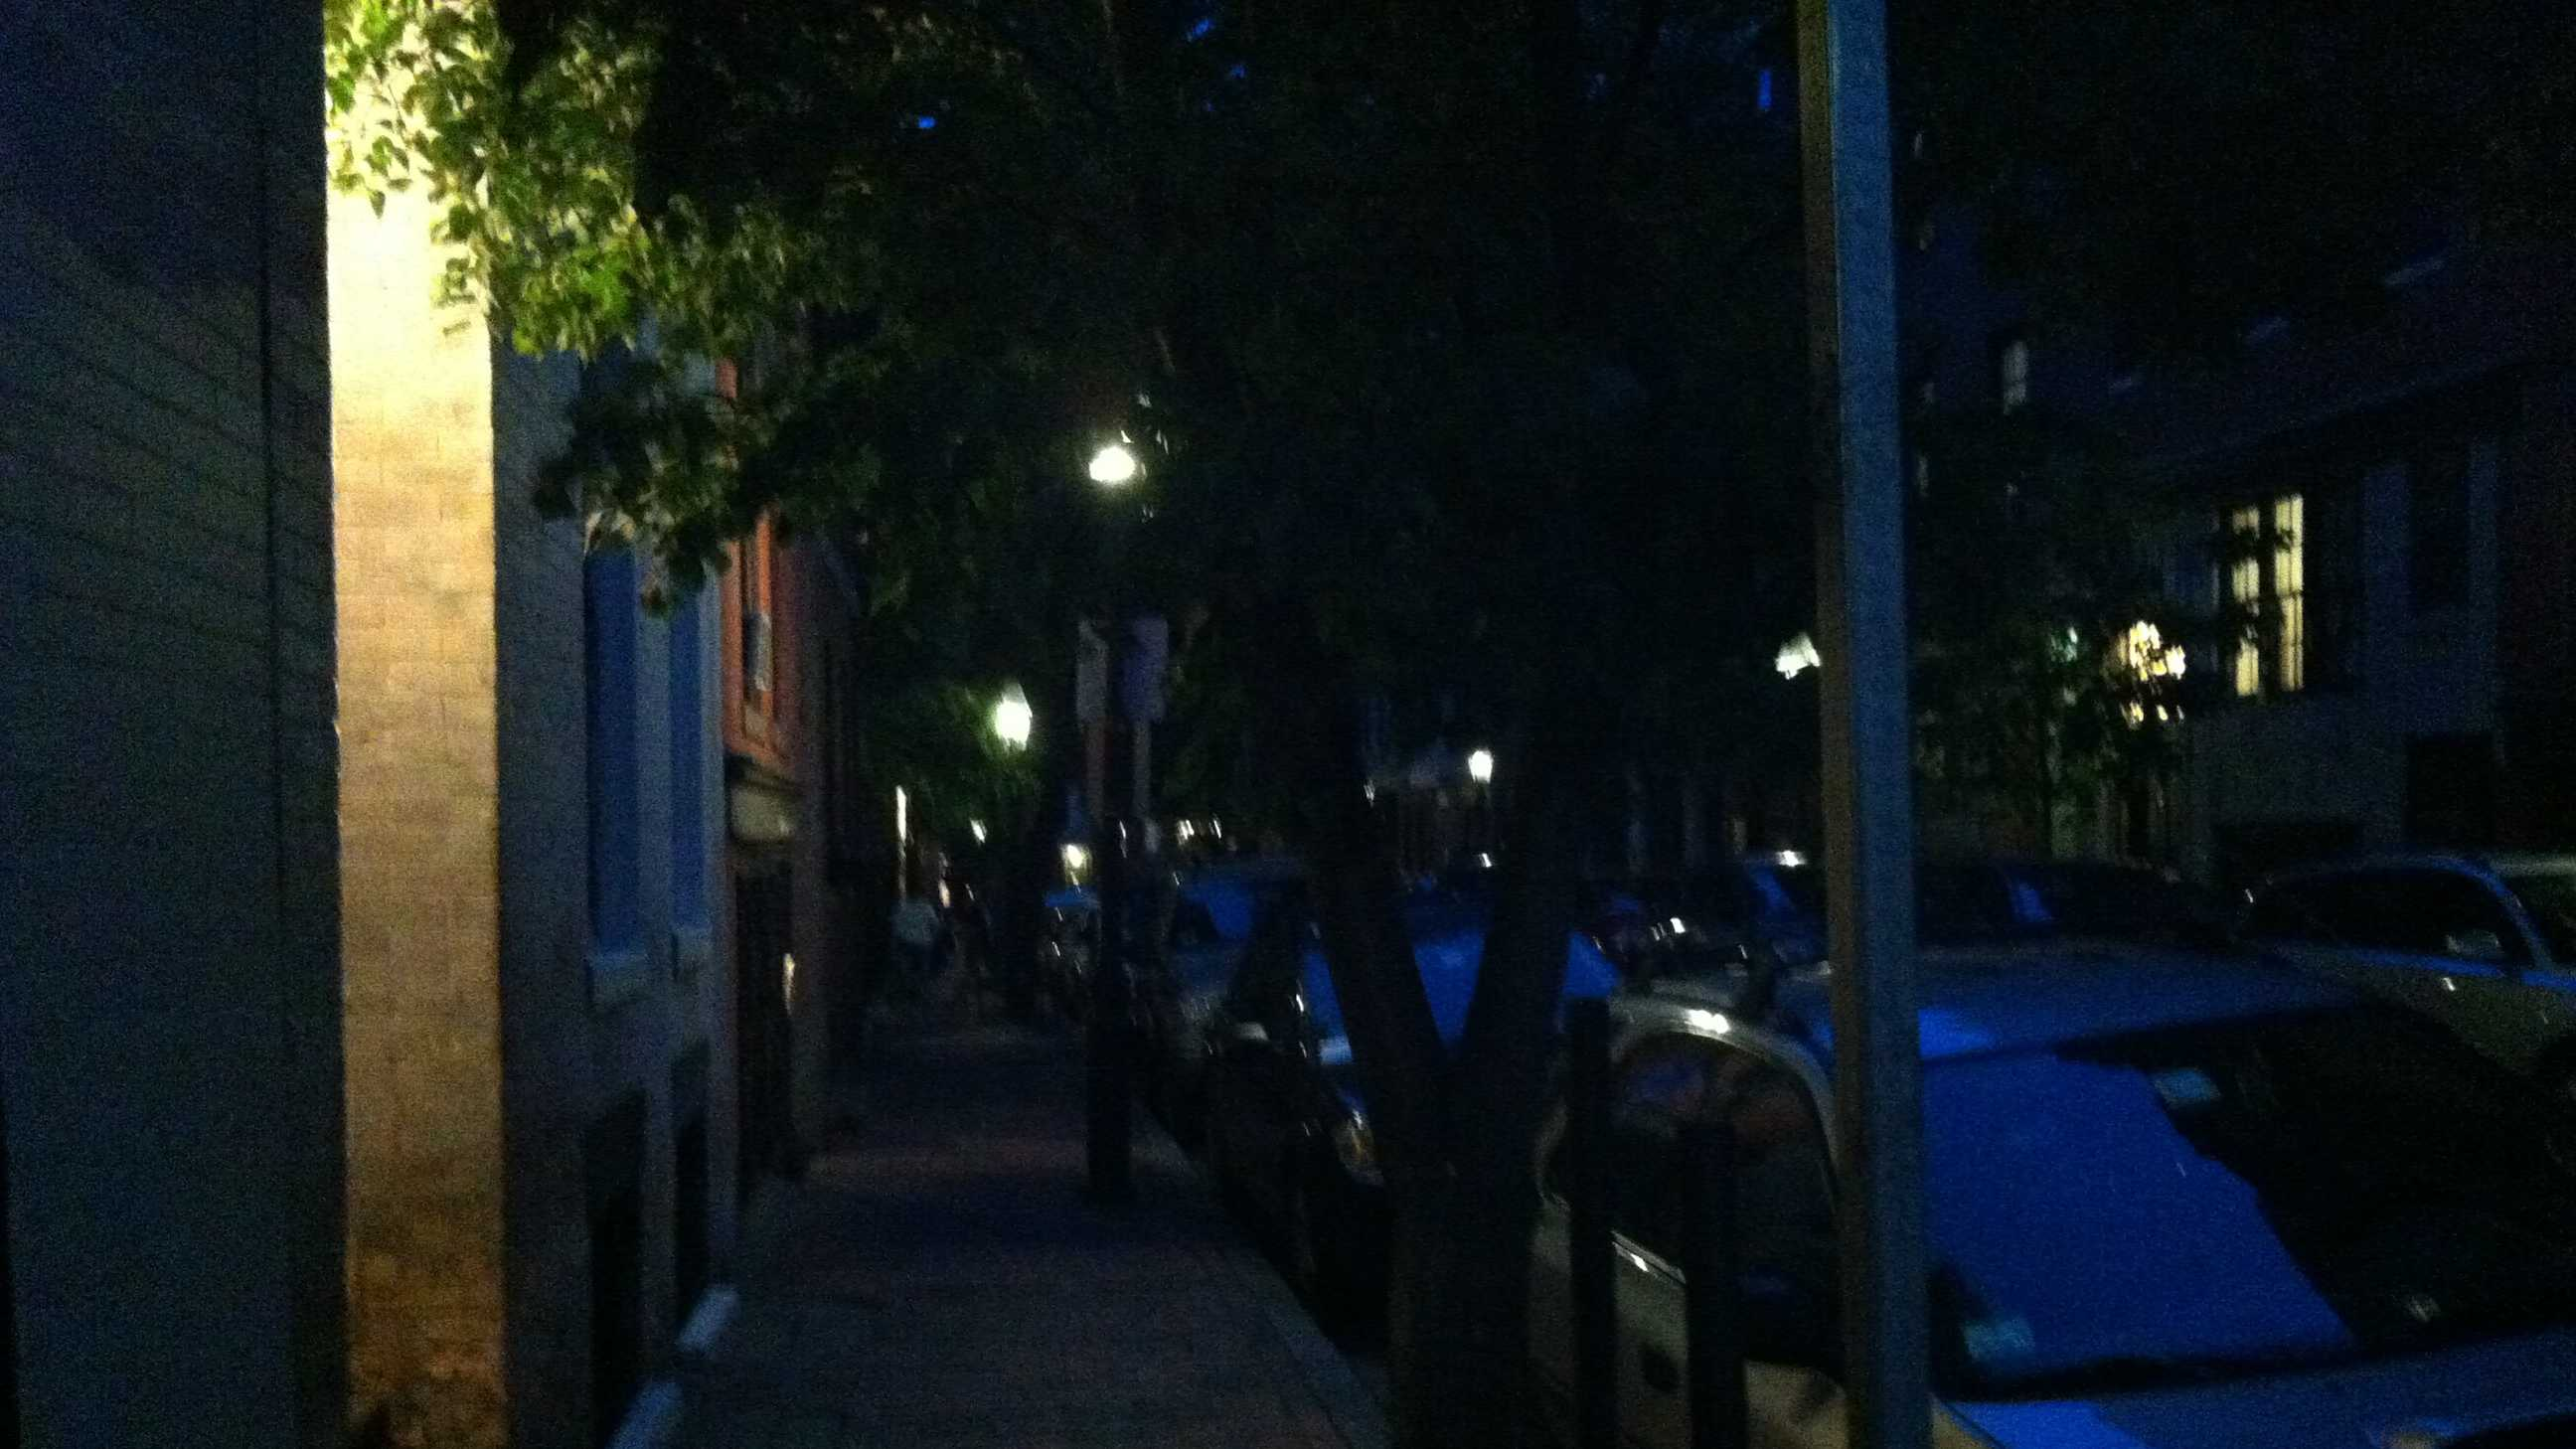 Beacon hill at night 060213